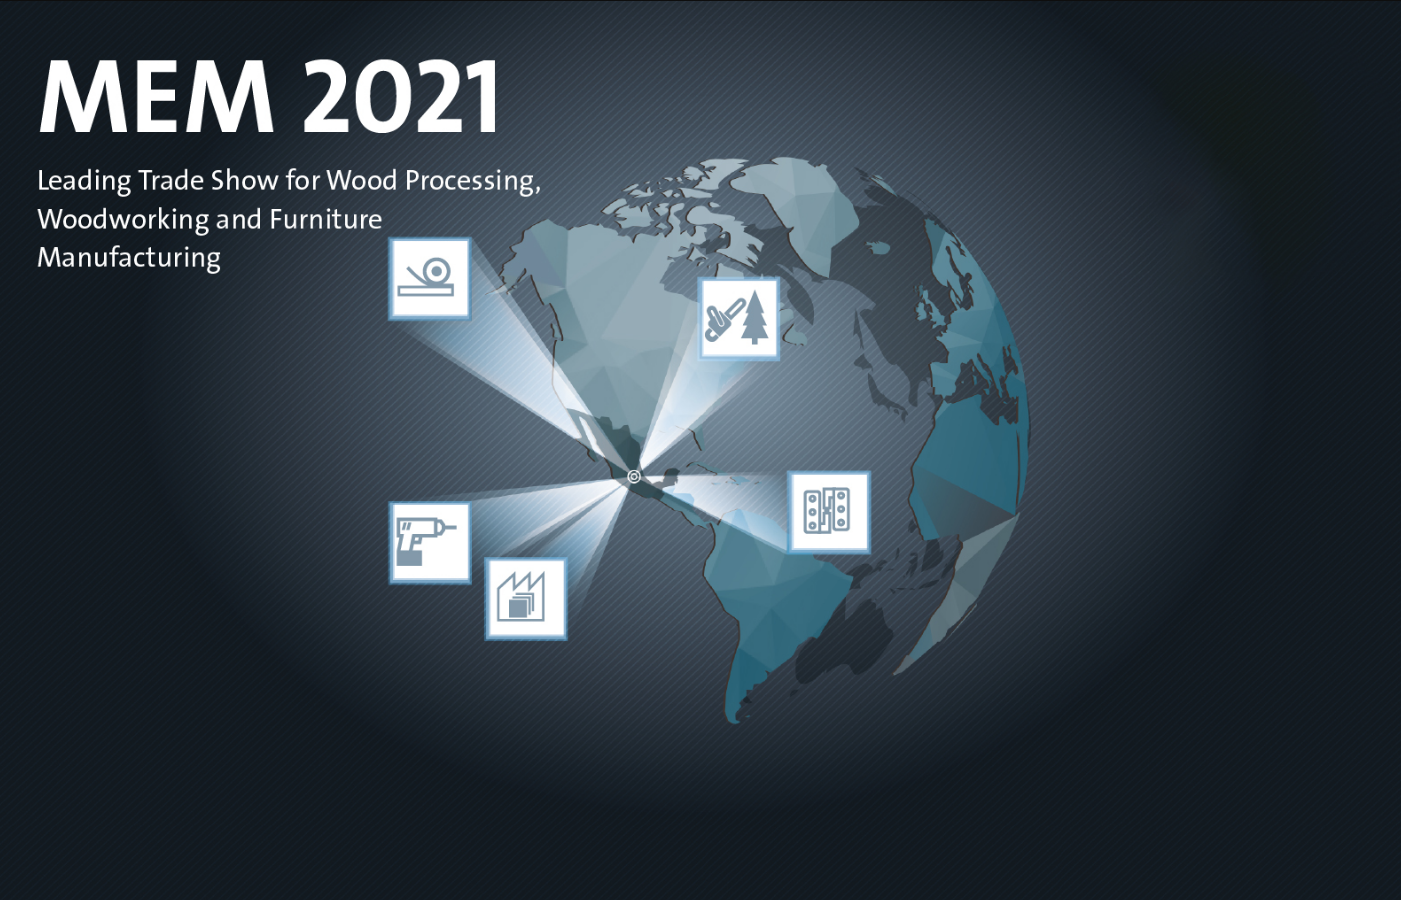 MEM Industrial – Techno Mueble International: Register online now!